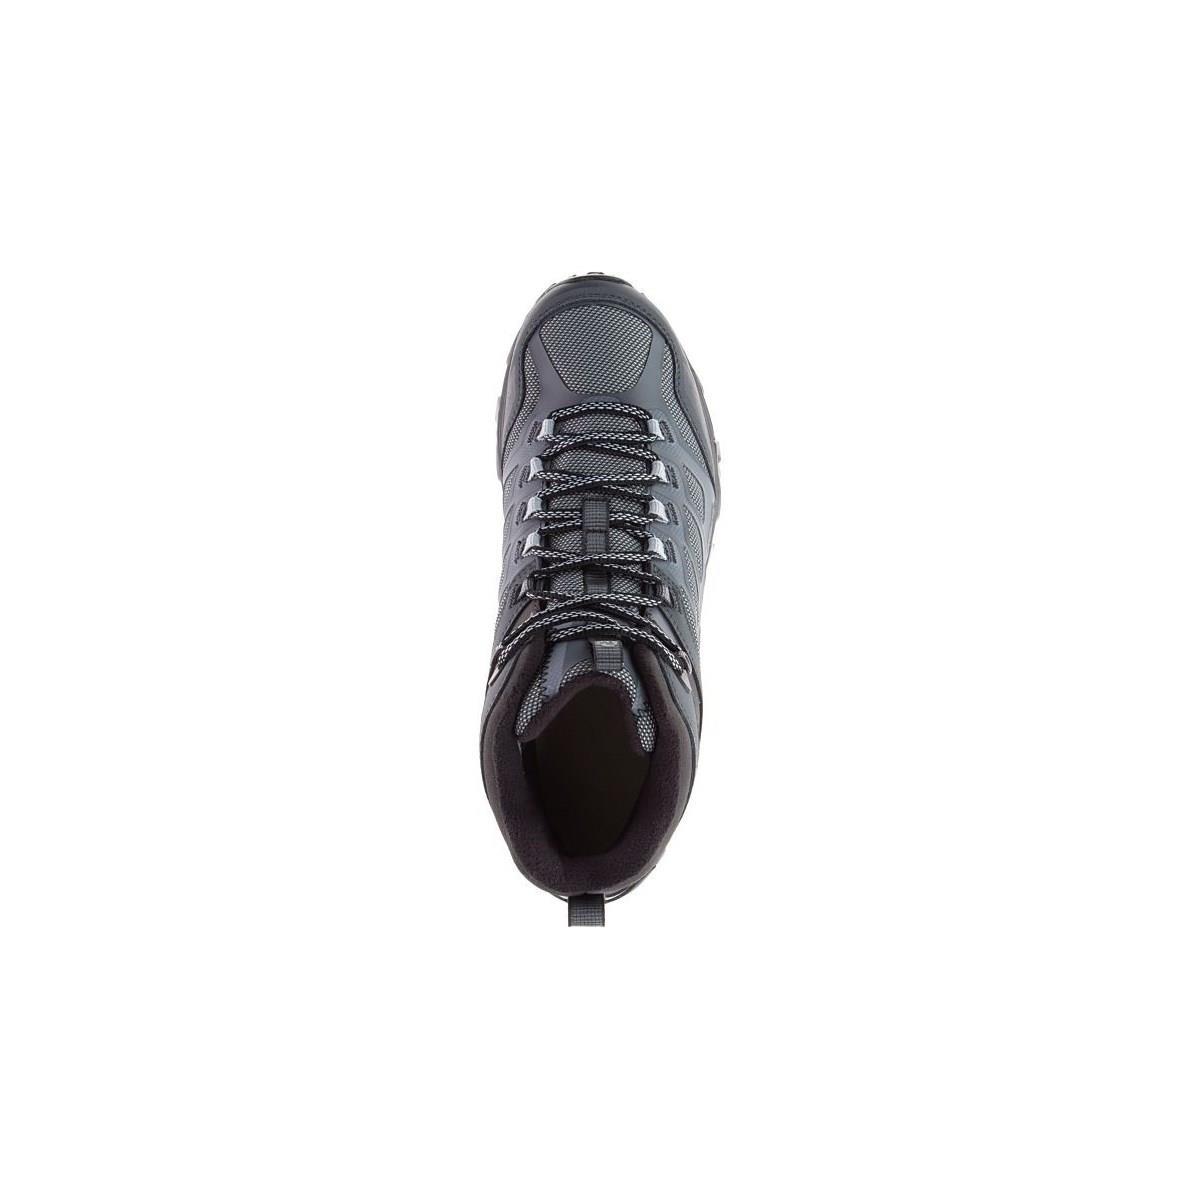 Merrell Moab Fst İce+Thermo Erkek Ayakkabı J09597